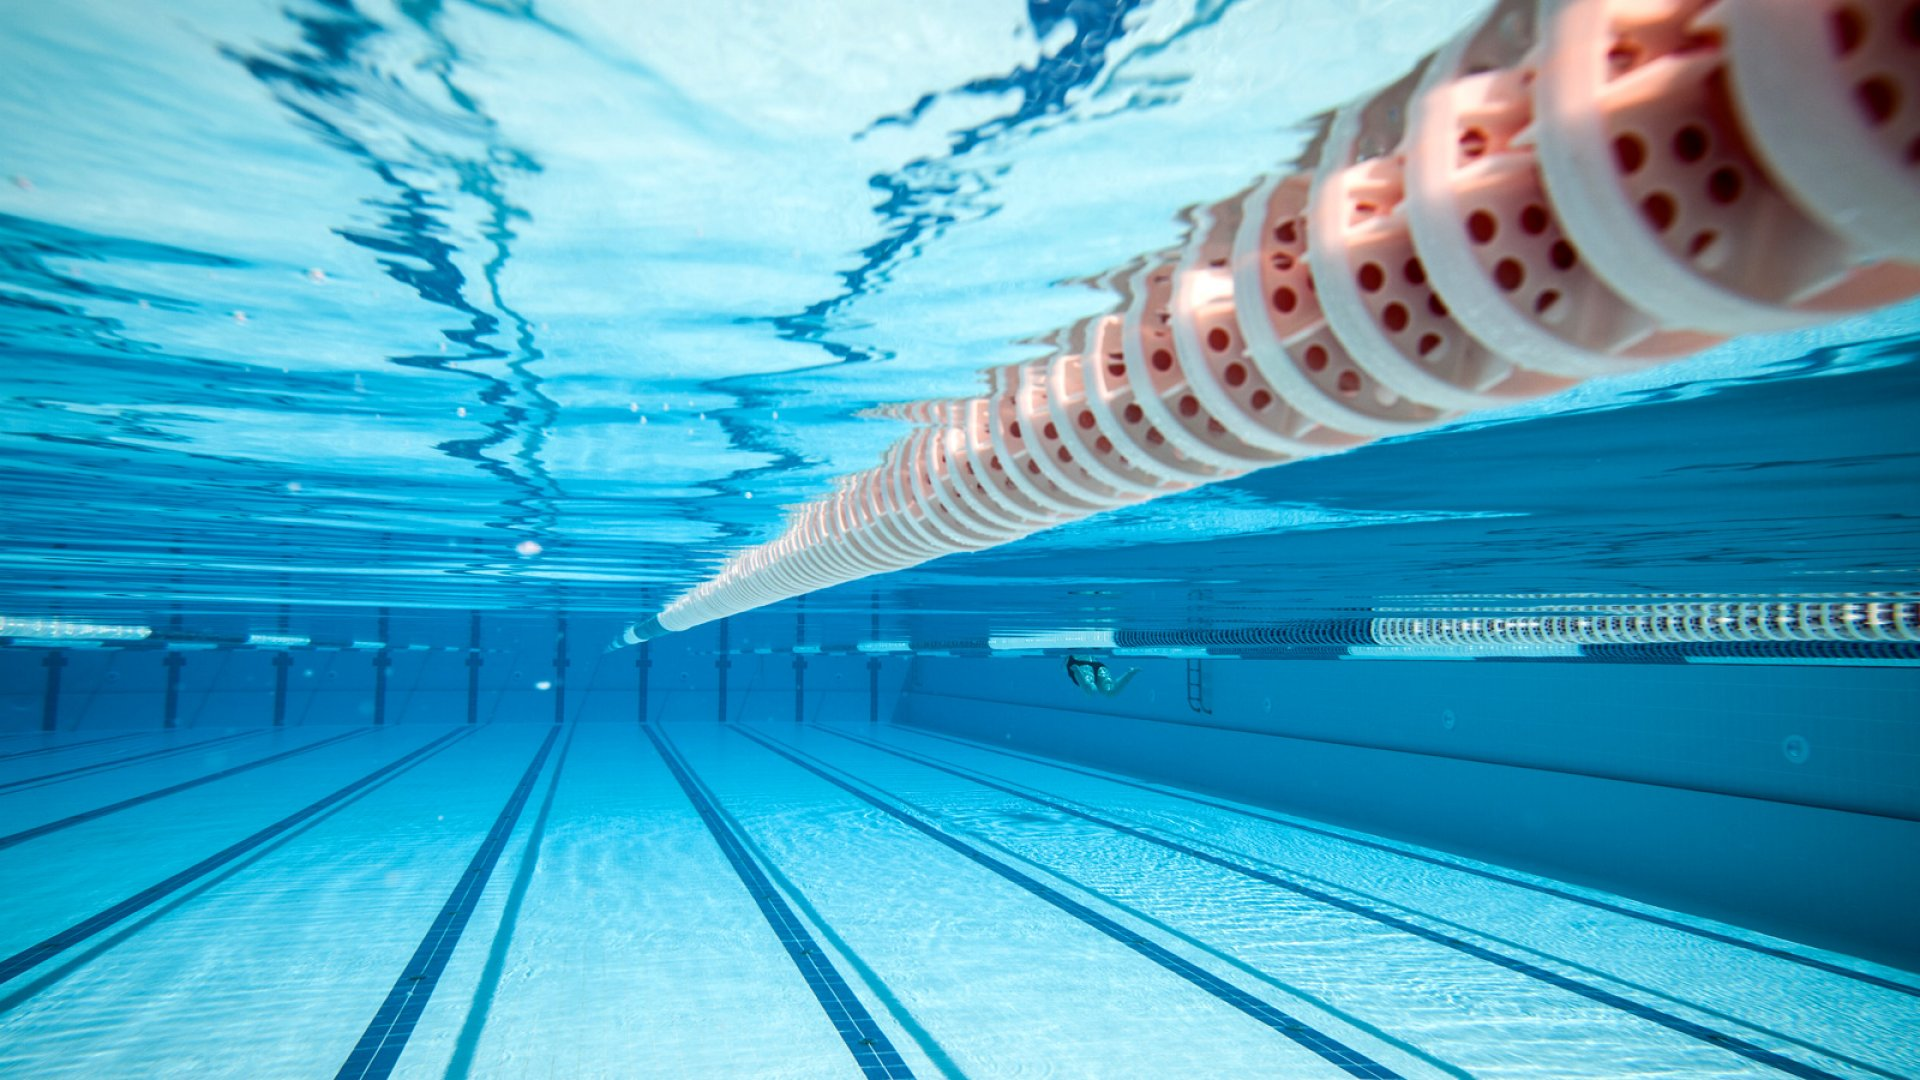 Entrepreneurship: Will You Sink or Swim?